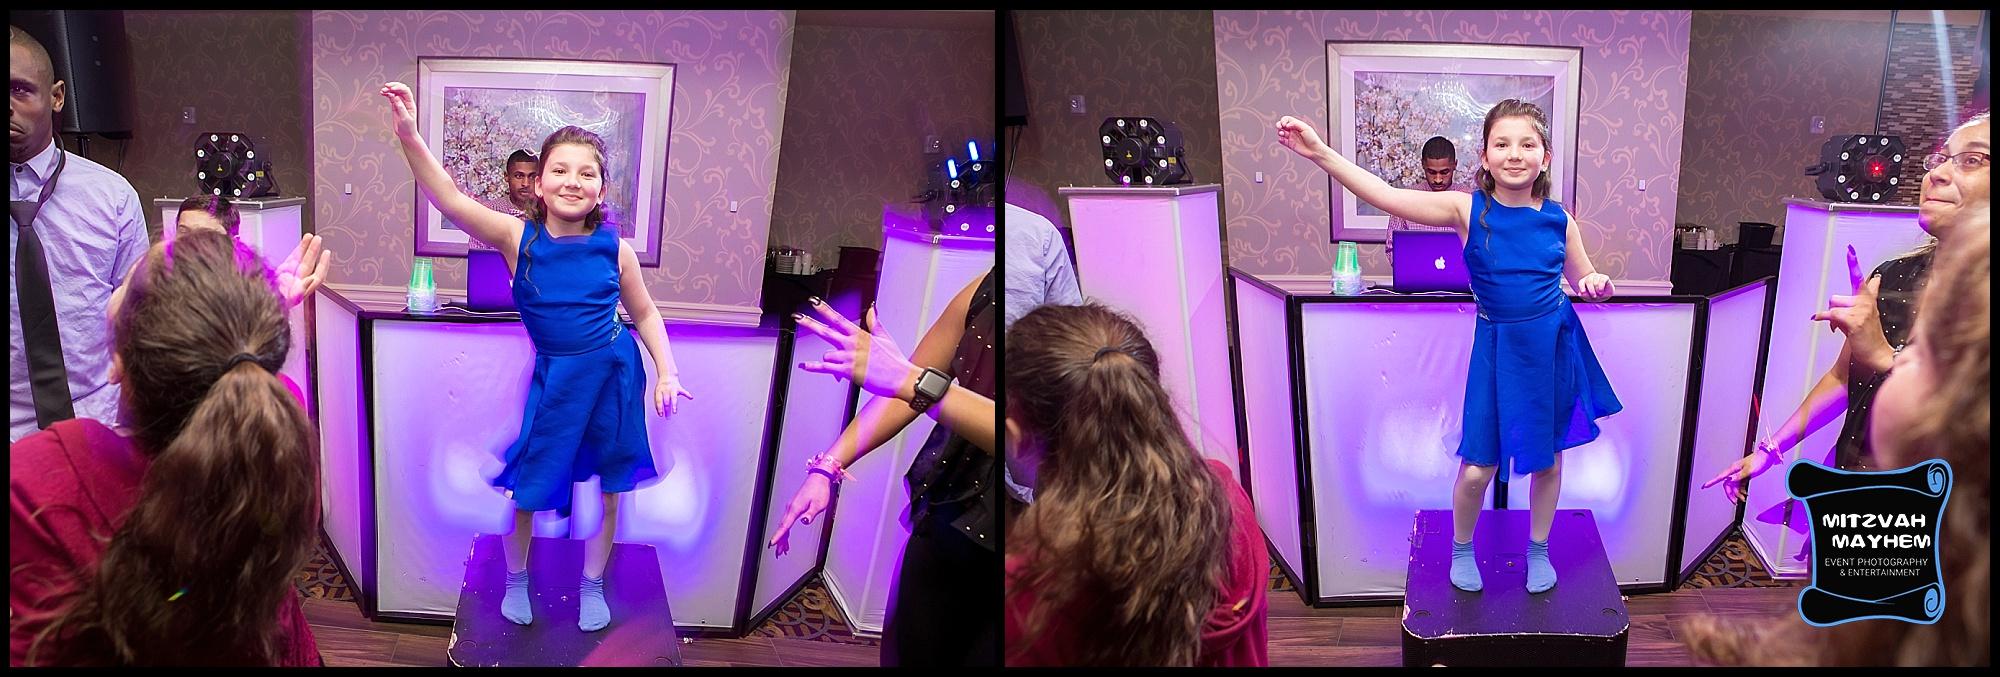 nj-bat-mitzvah-crystal-ballroom-photography-187.jpg